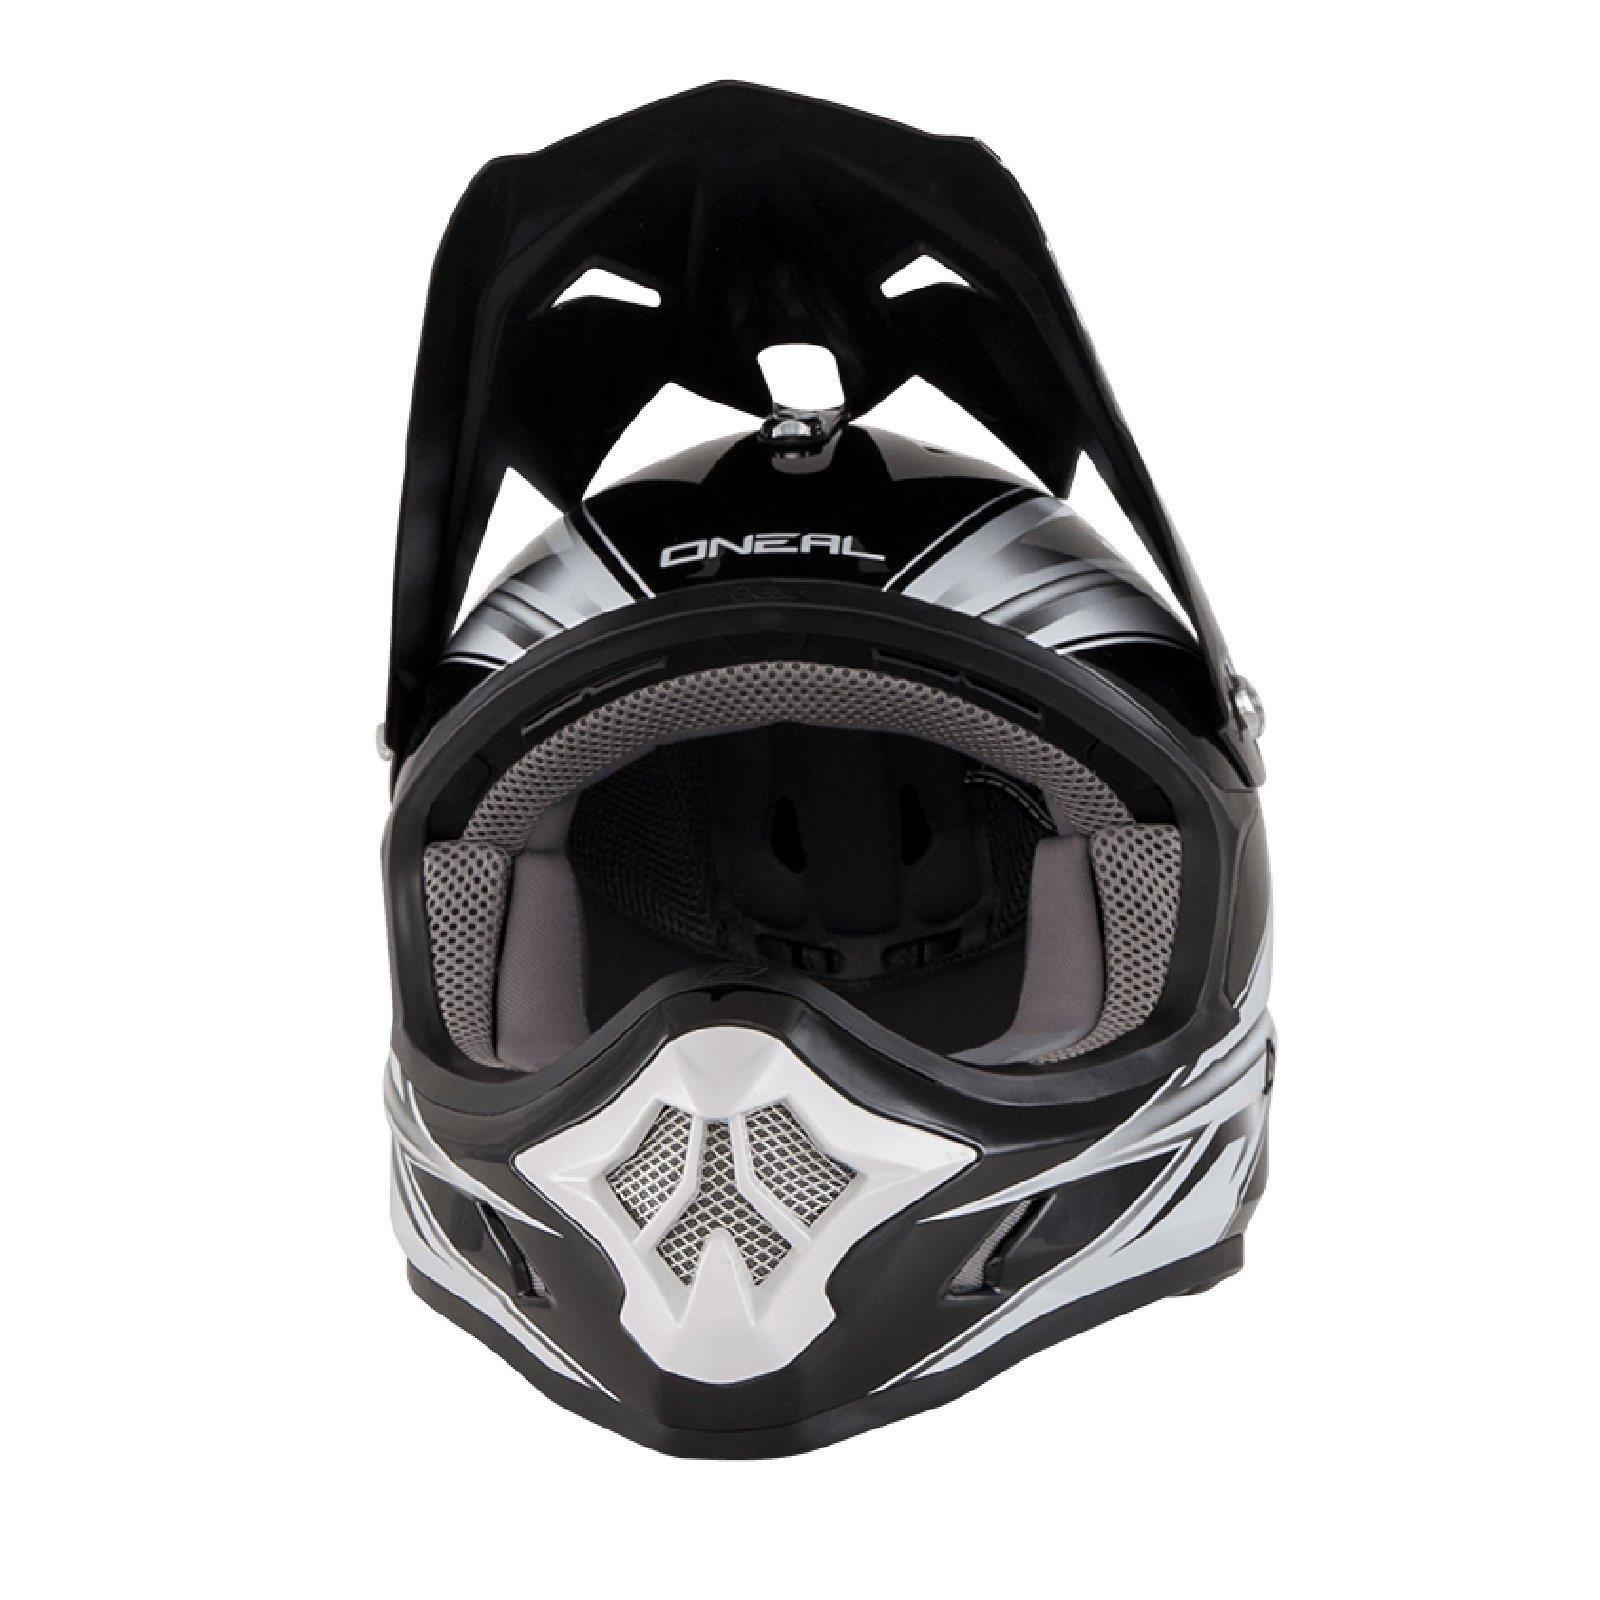 ONeal-Motocross-casco-MX-ENDURO-MOTO-BICI-FUORISTRADA-CROSS-Series-Adventure miniatura 116